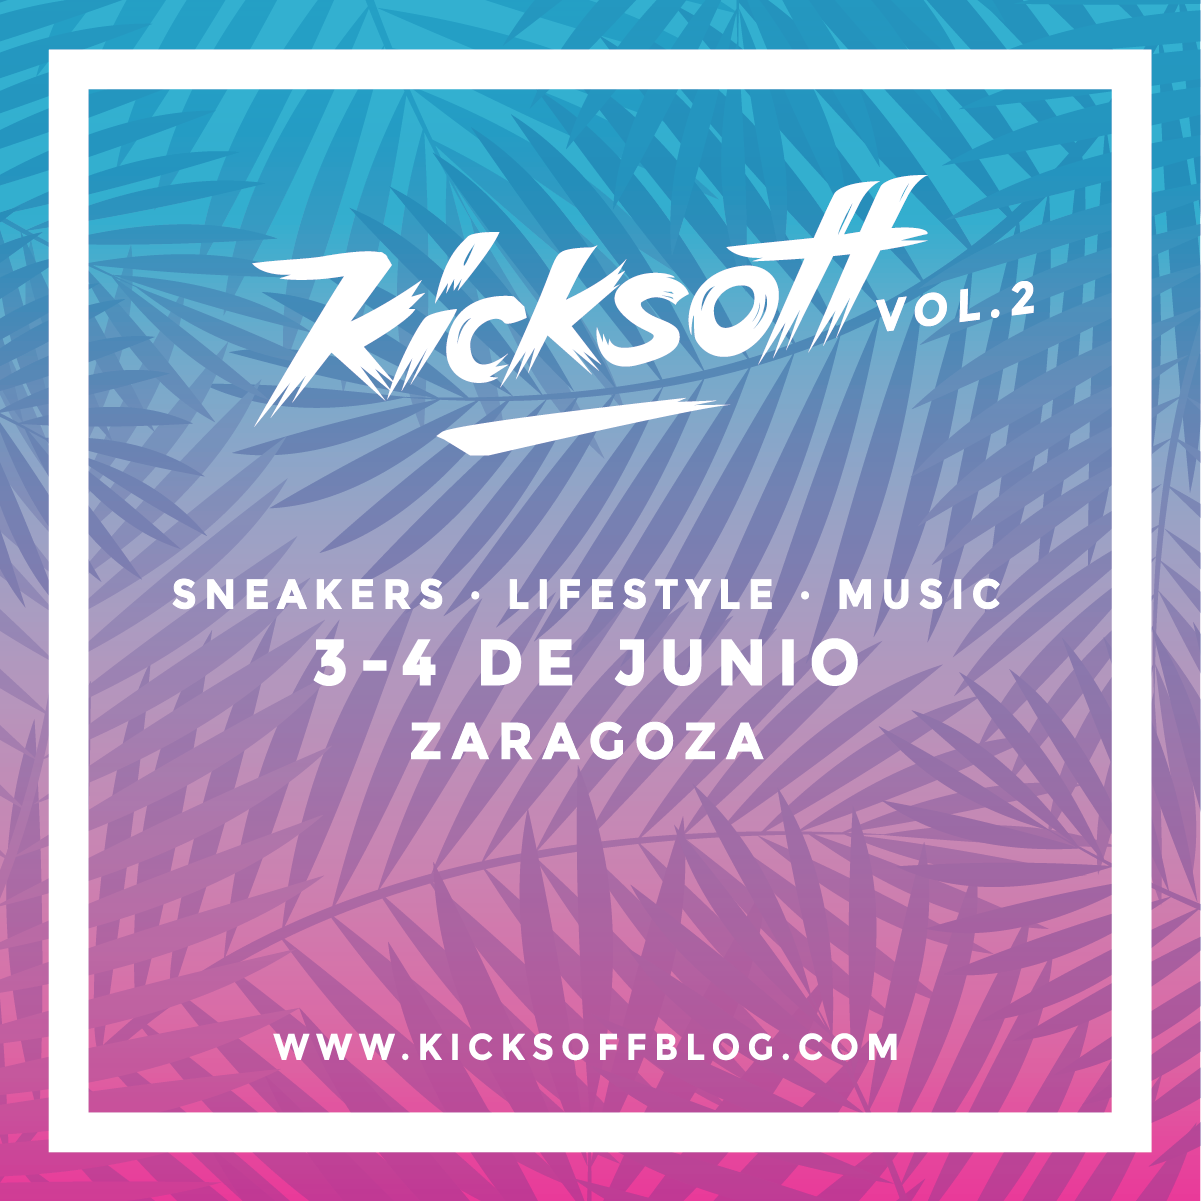 Kicks Off! The Sneaker Blog: AVANCE: KICKS OFF Vol.2 > 3